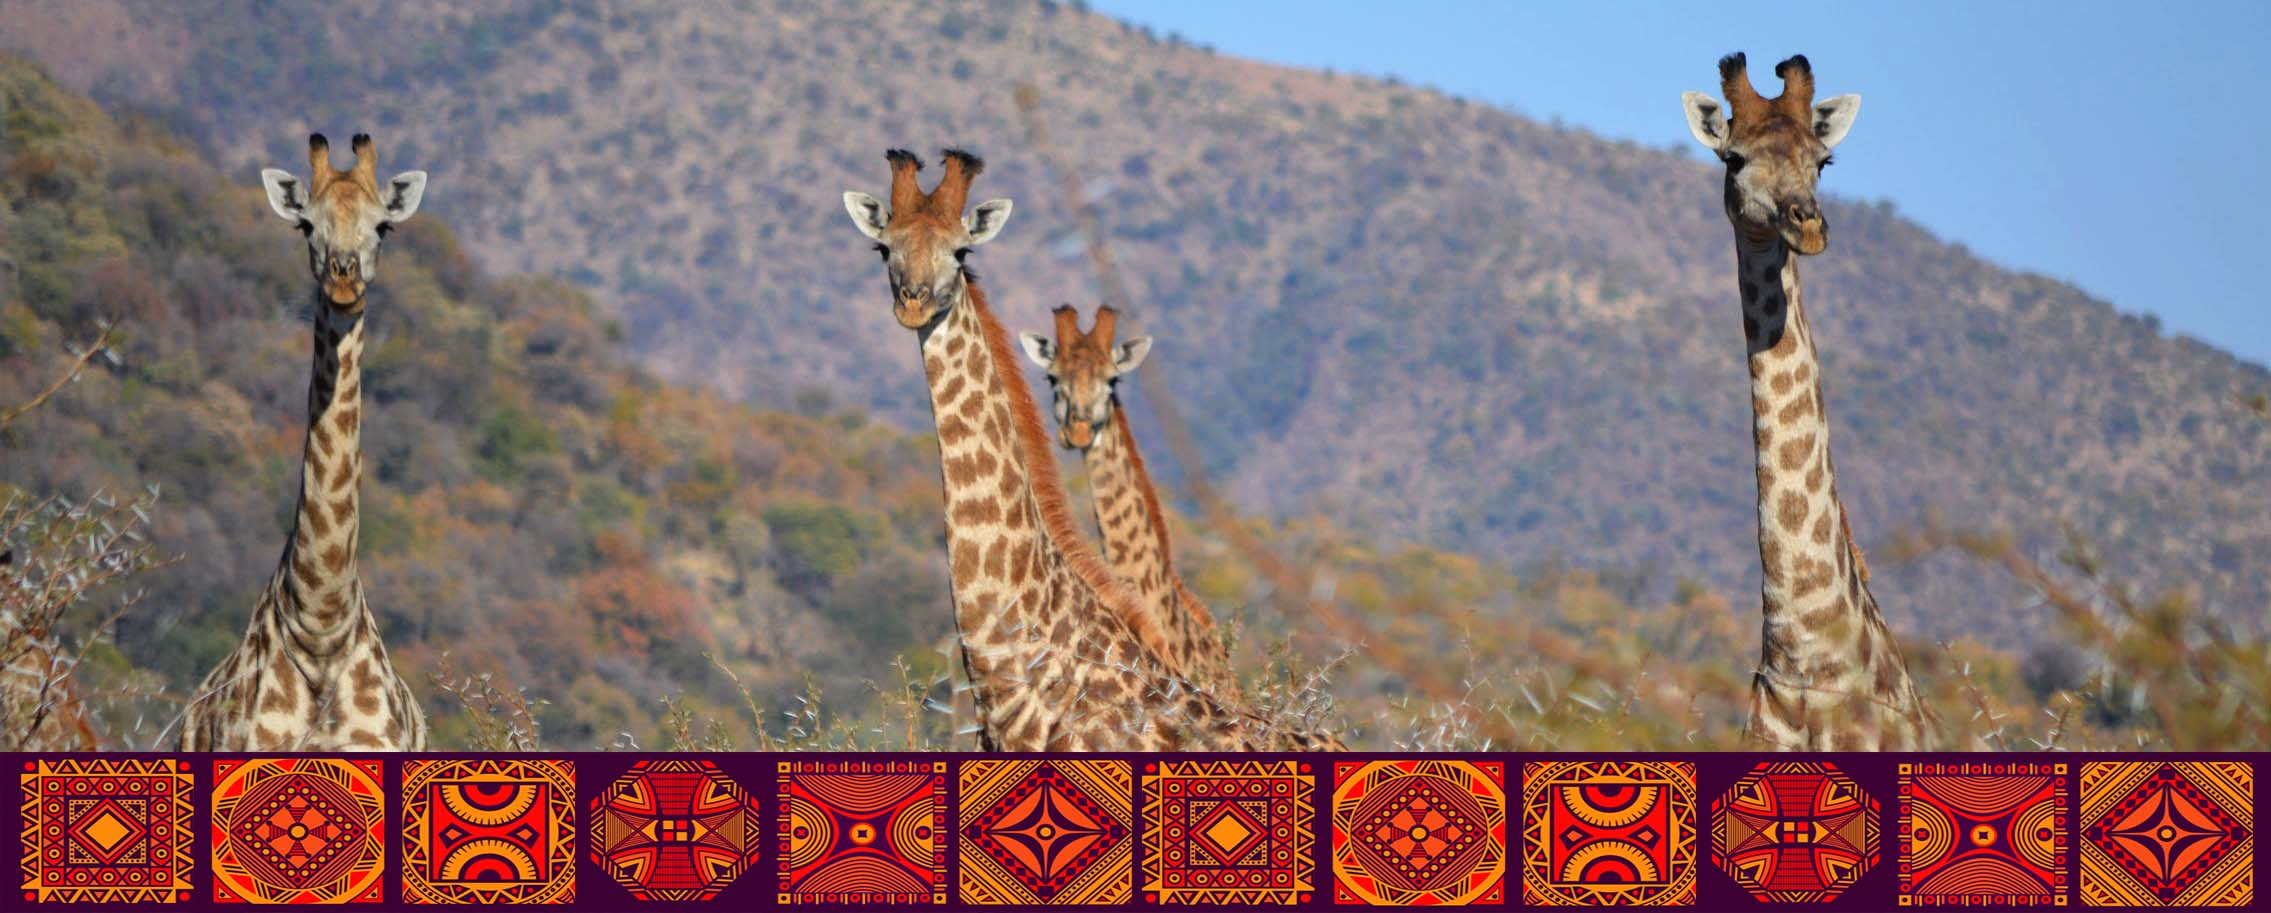 Giraffe Herd w symbols master cropped.jpg